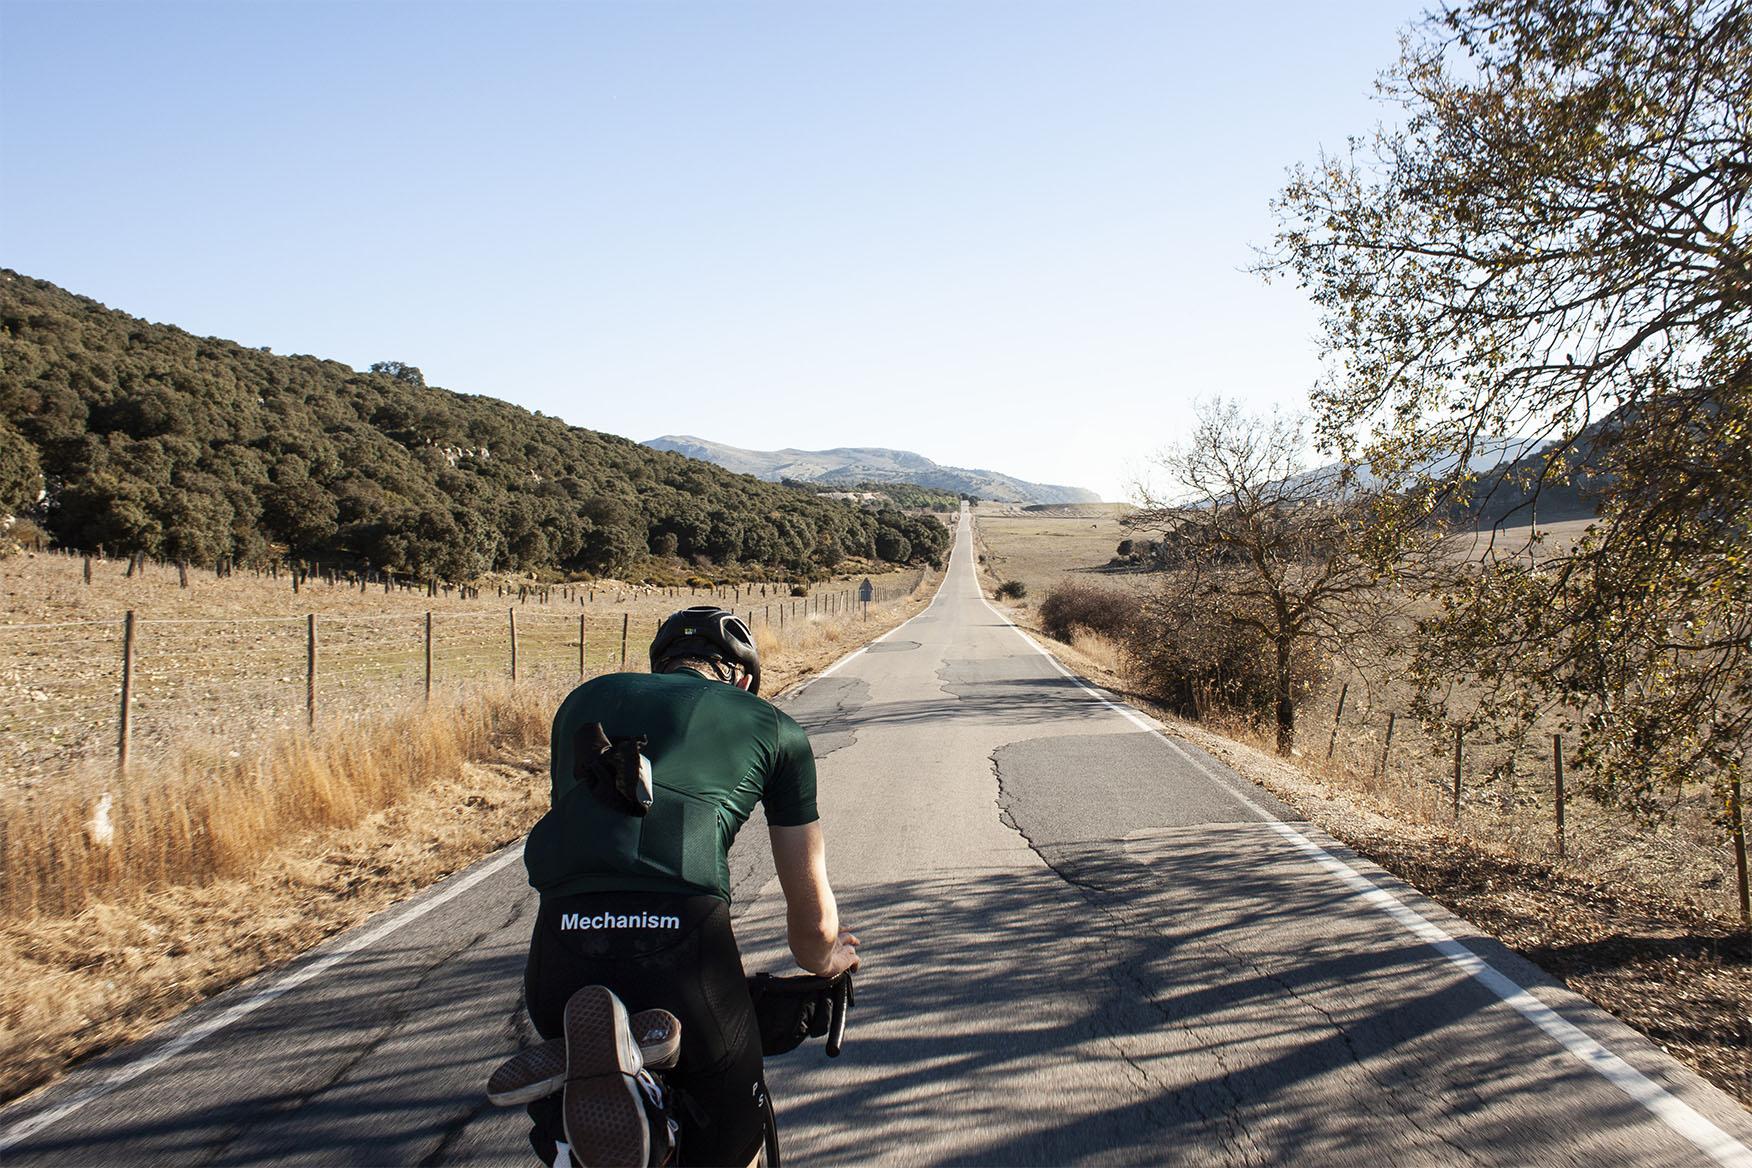 malaga-road-bike-rental-landscape.jpg